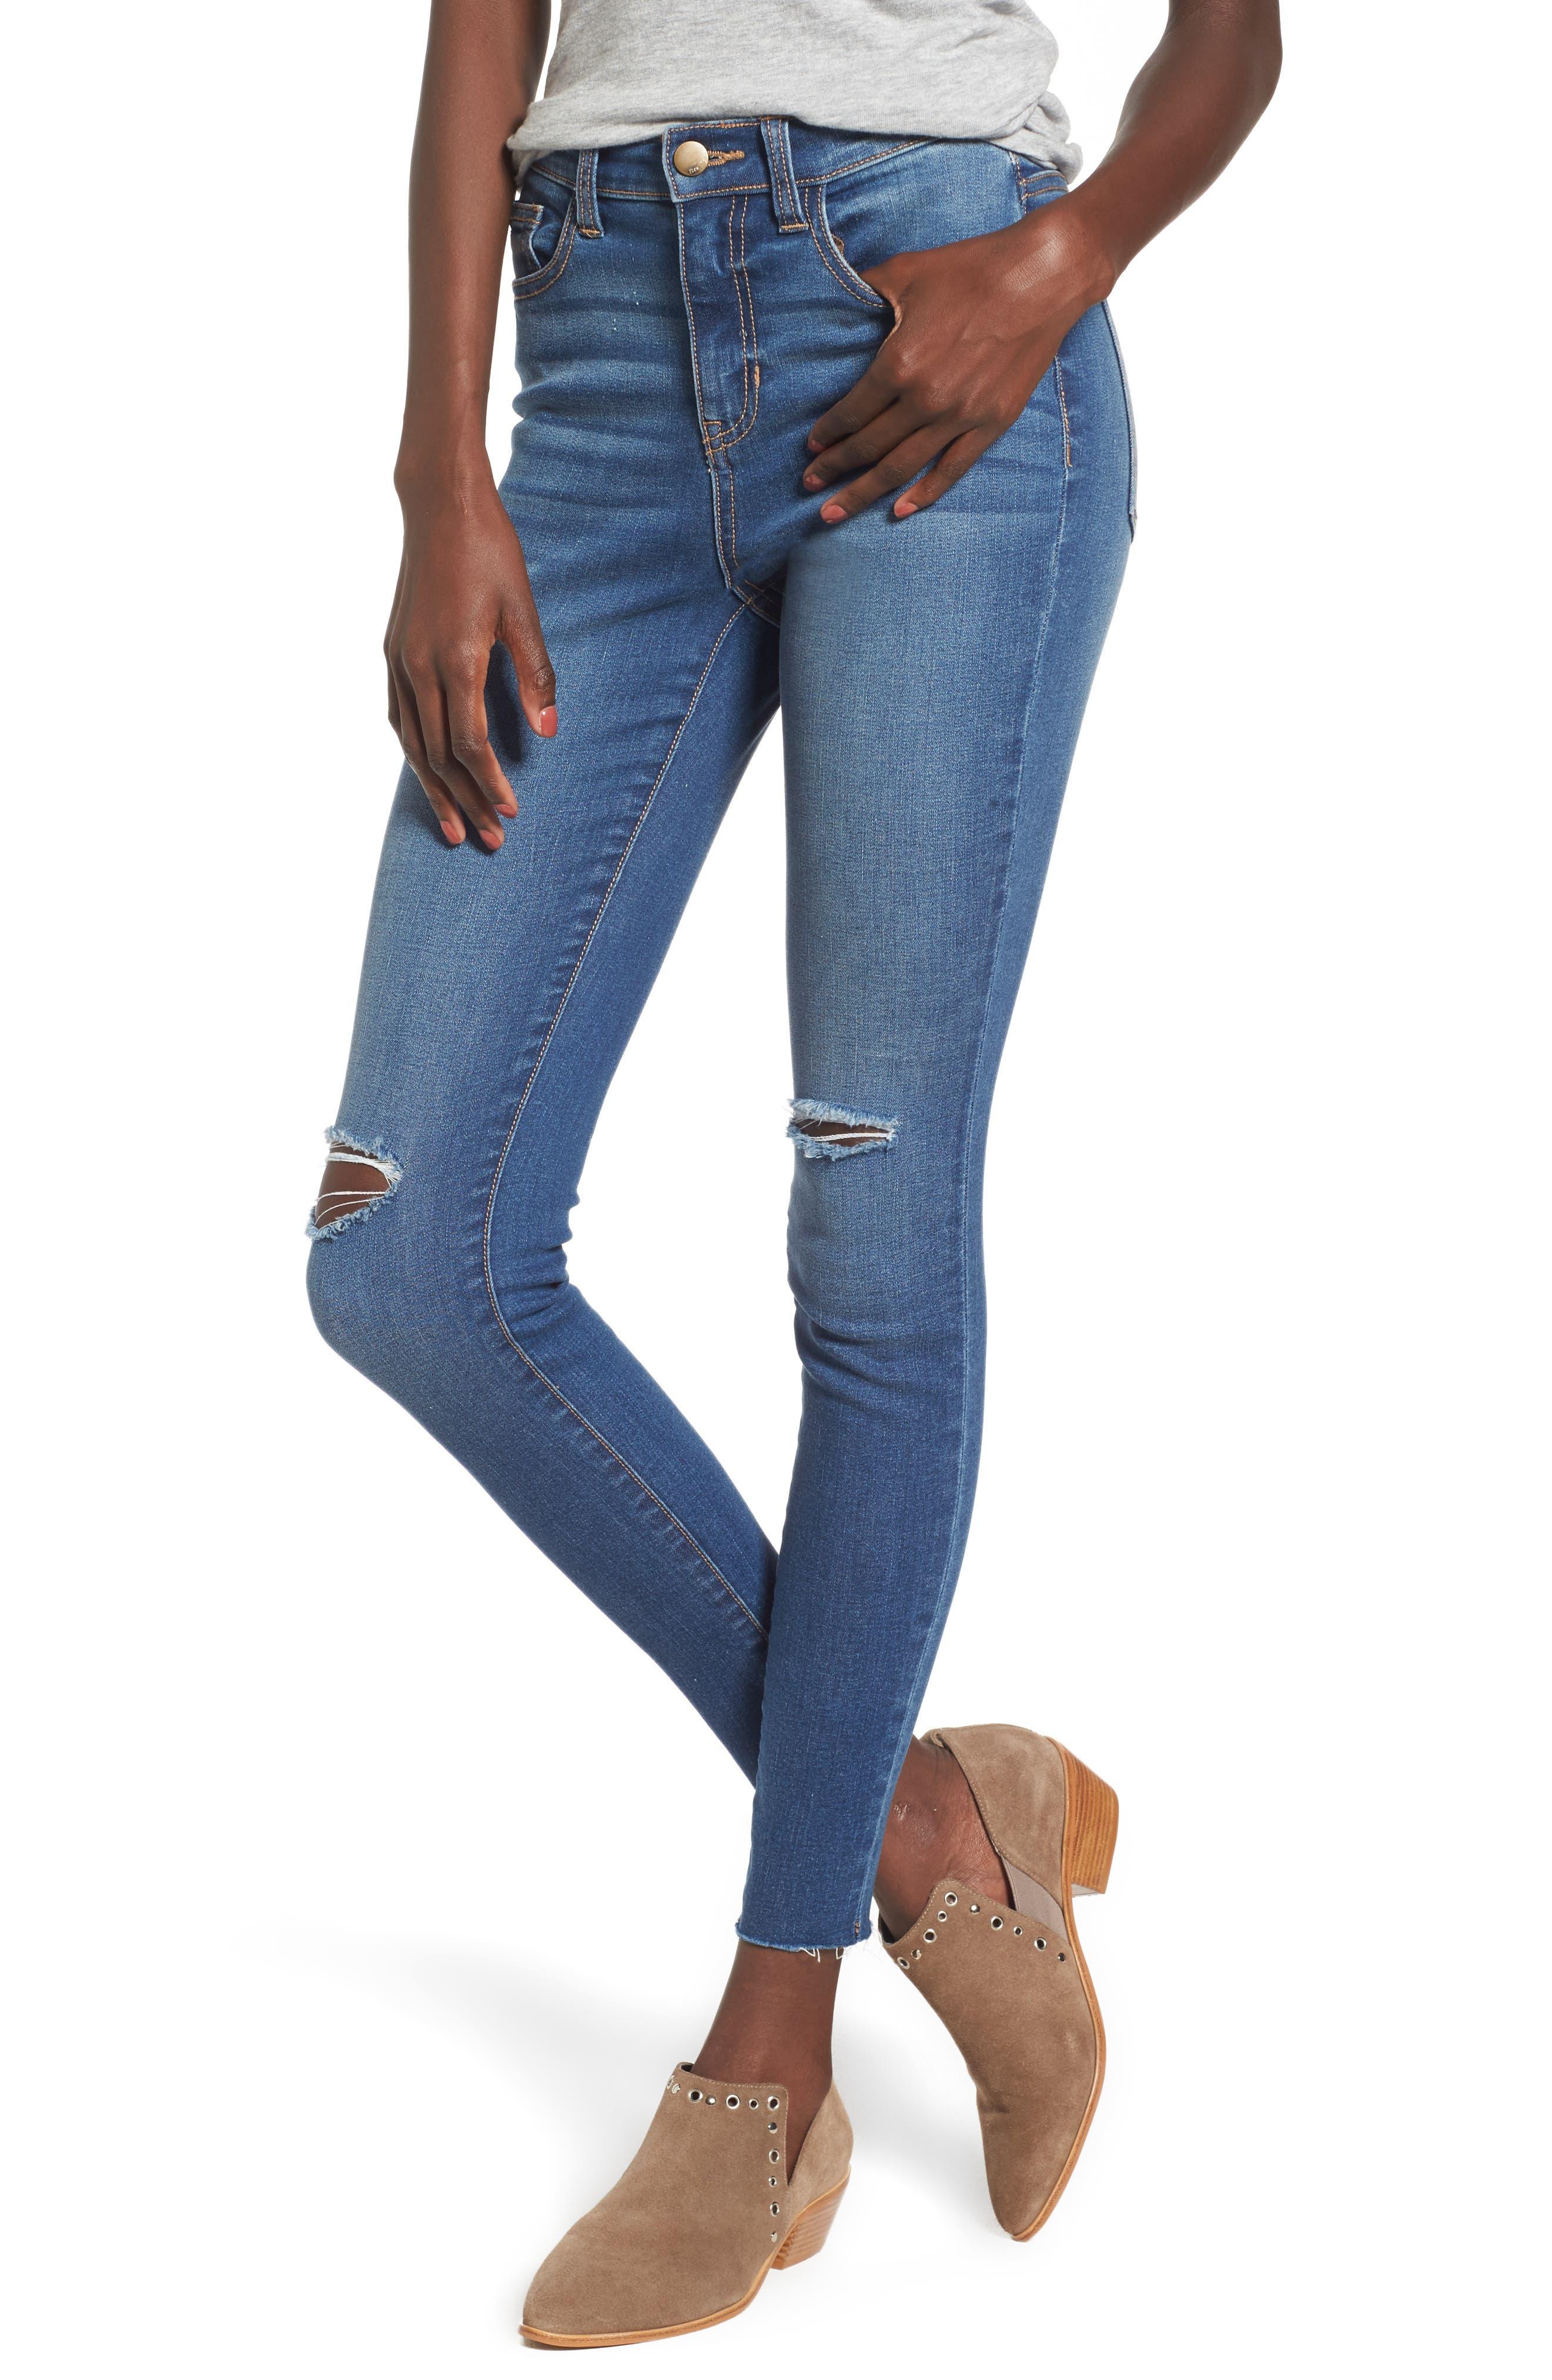 SP Black Ripped High Waist Skinny Jeans